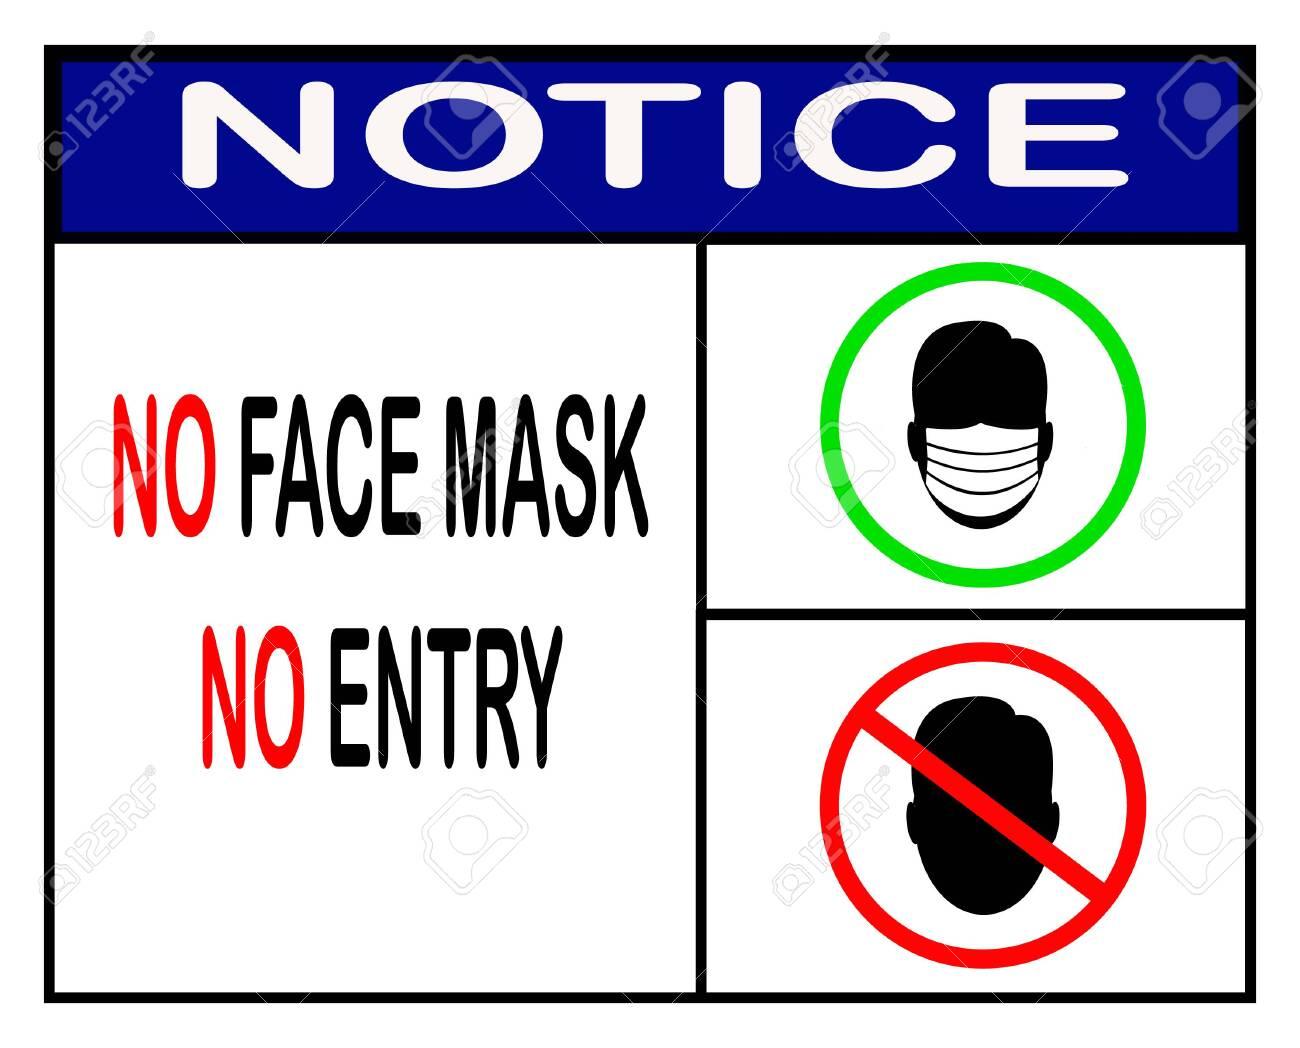 no face mask no entry,notice or mandatory sign vector - 148039624